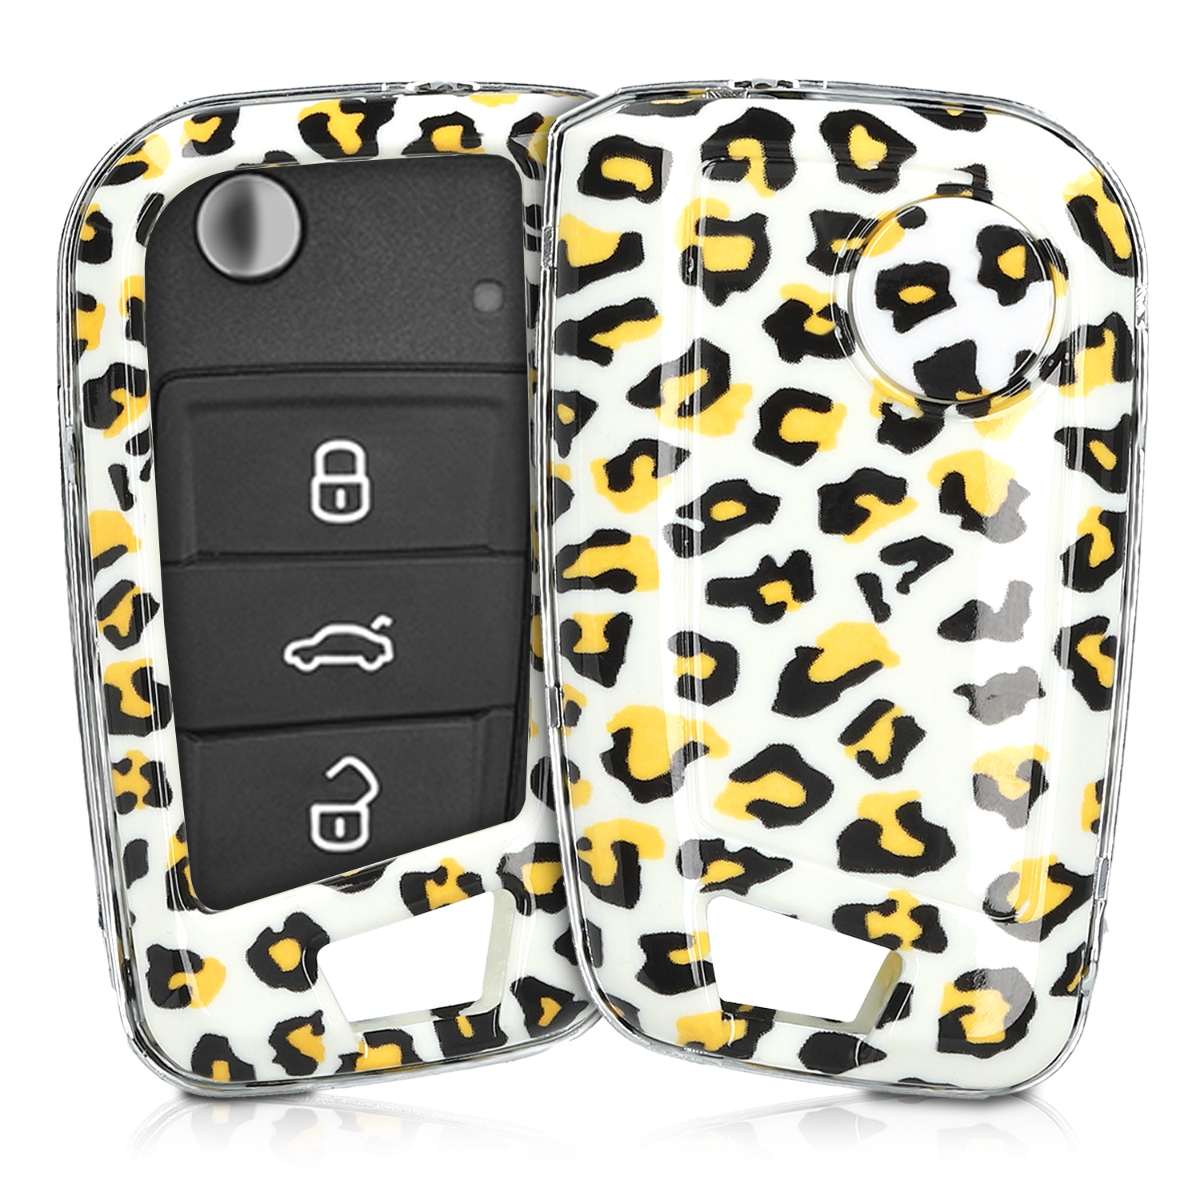 KW Σκληρή Θήκη Κλειδιού VW Golf 7 MK7 - 3 Κουμπιά - Black / Yellow / White (49668.02)